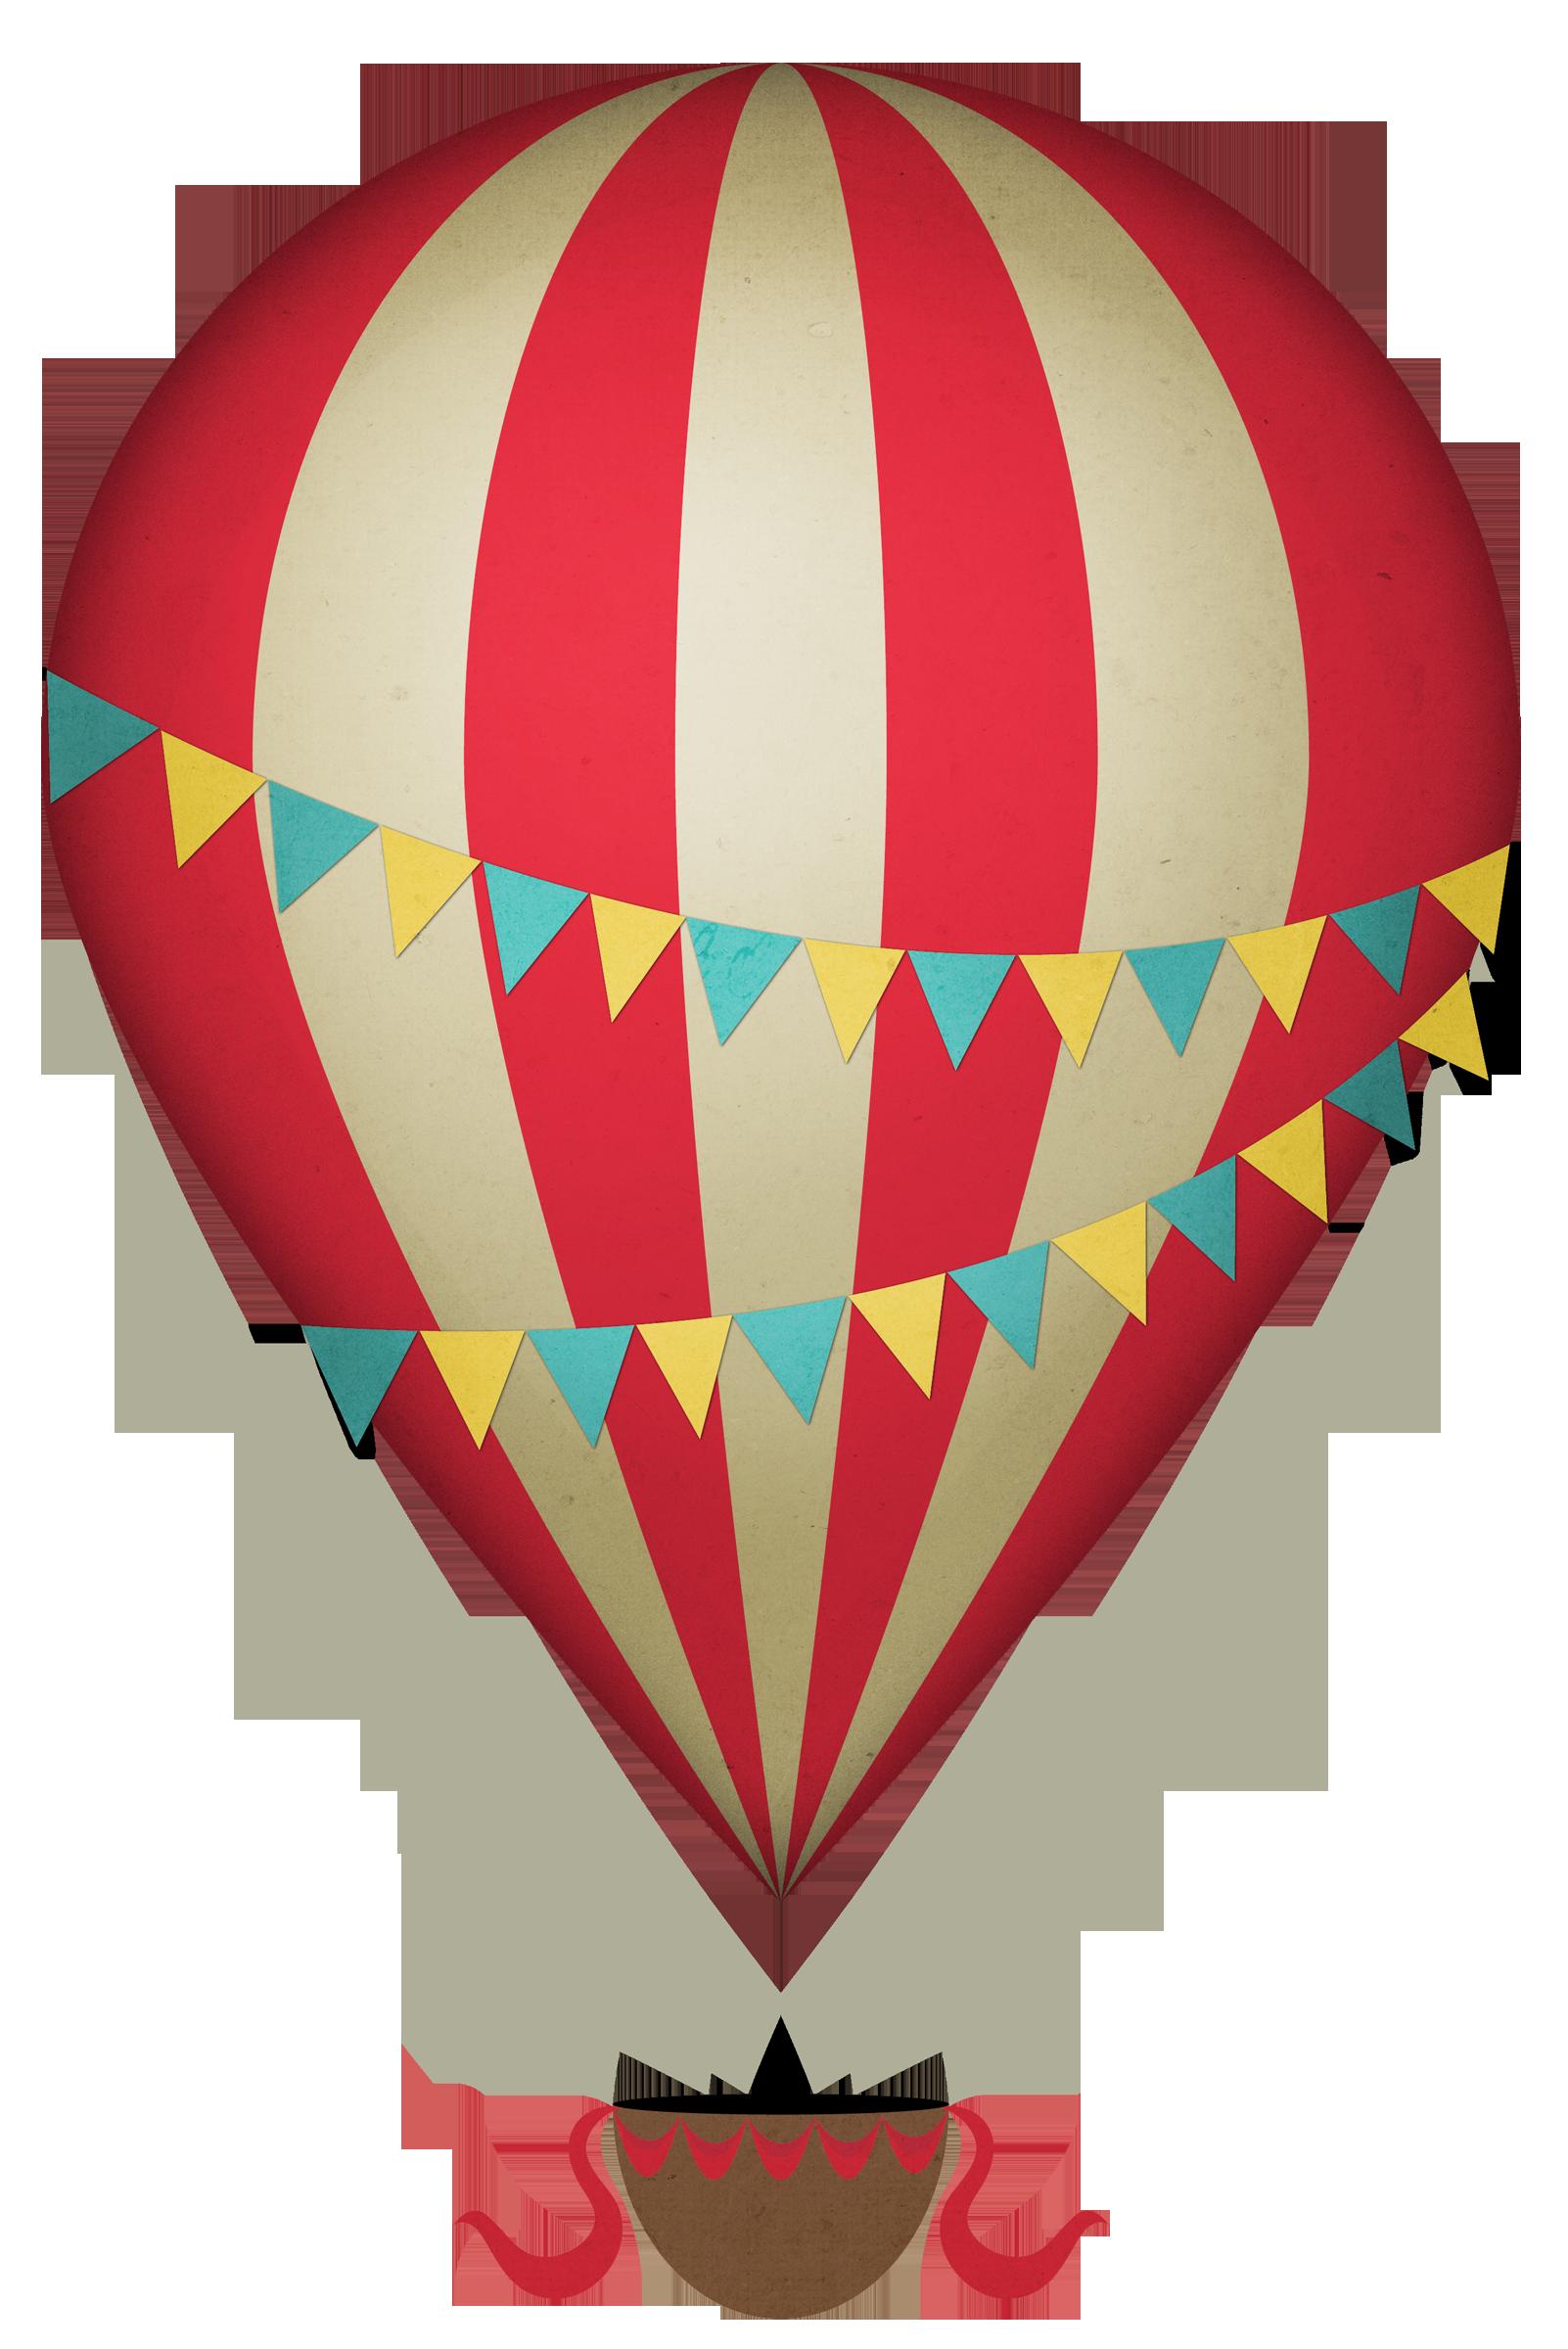 vector royalty free library Arcade clipart vintage carnival games. Hot air balloon transportations.